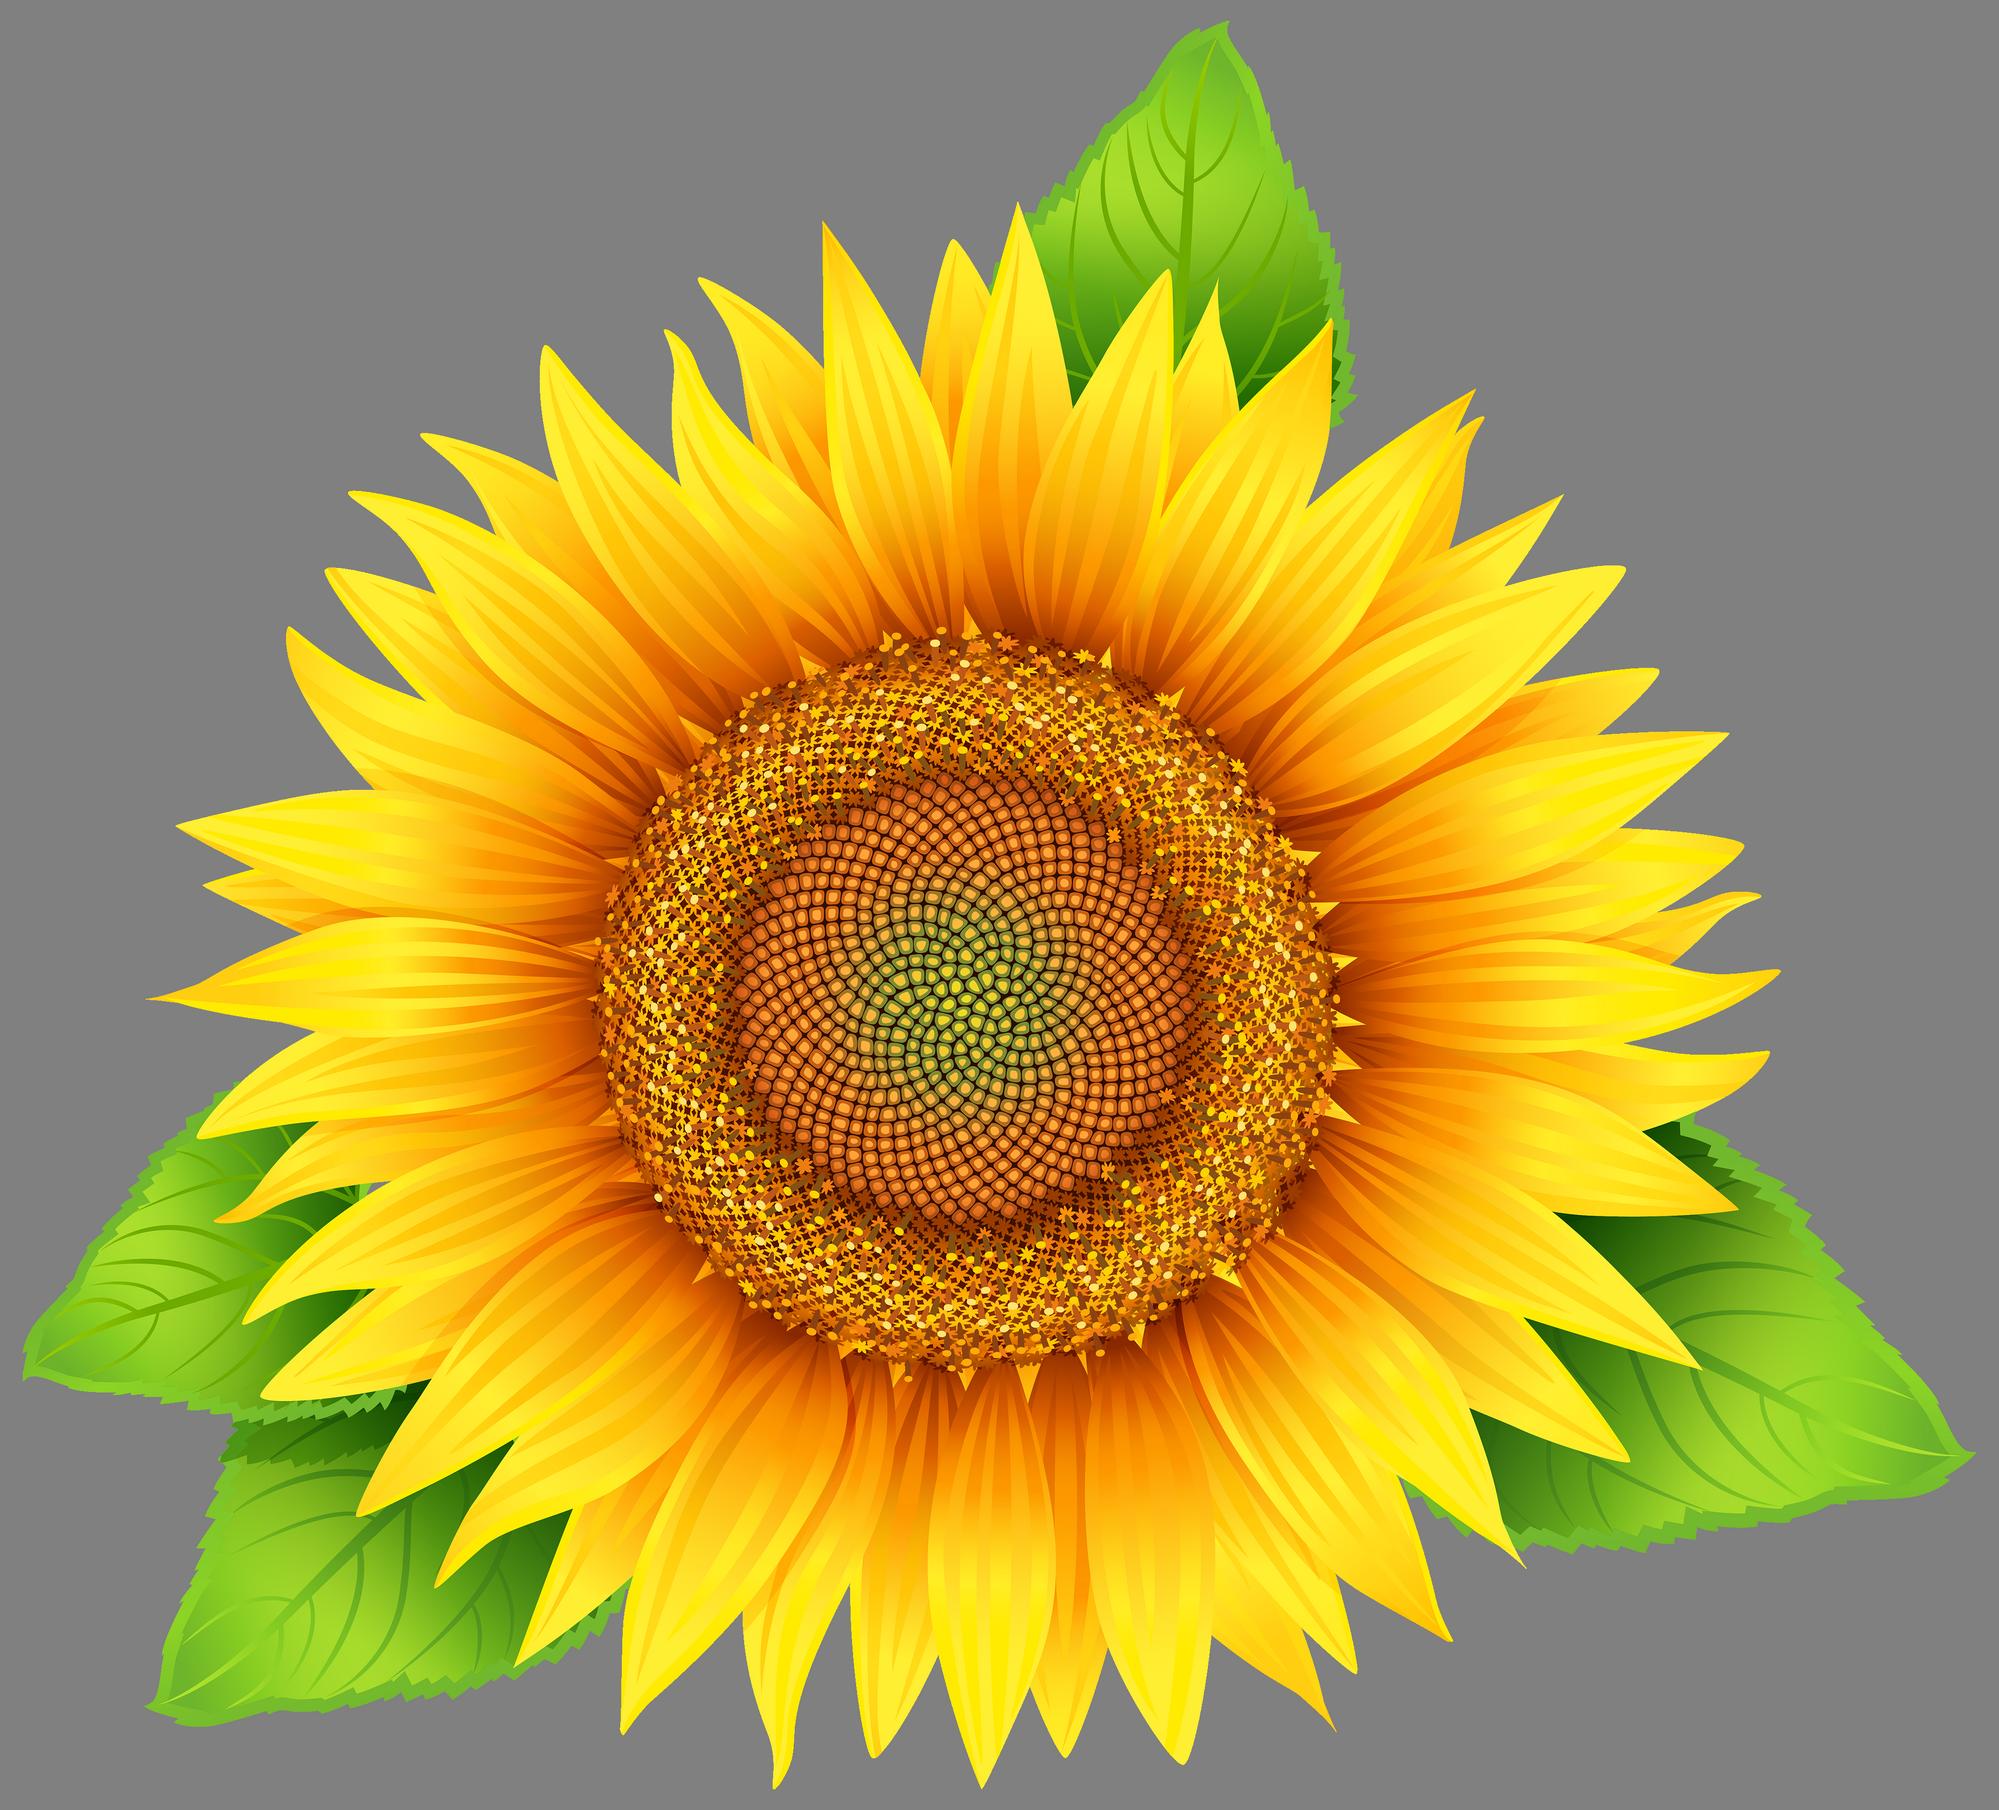 Sunflower Png Images Transparent Background: Sunflower PNG Image - PurePNG